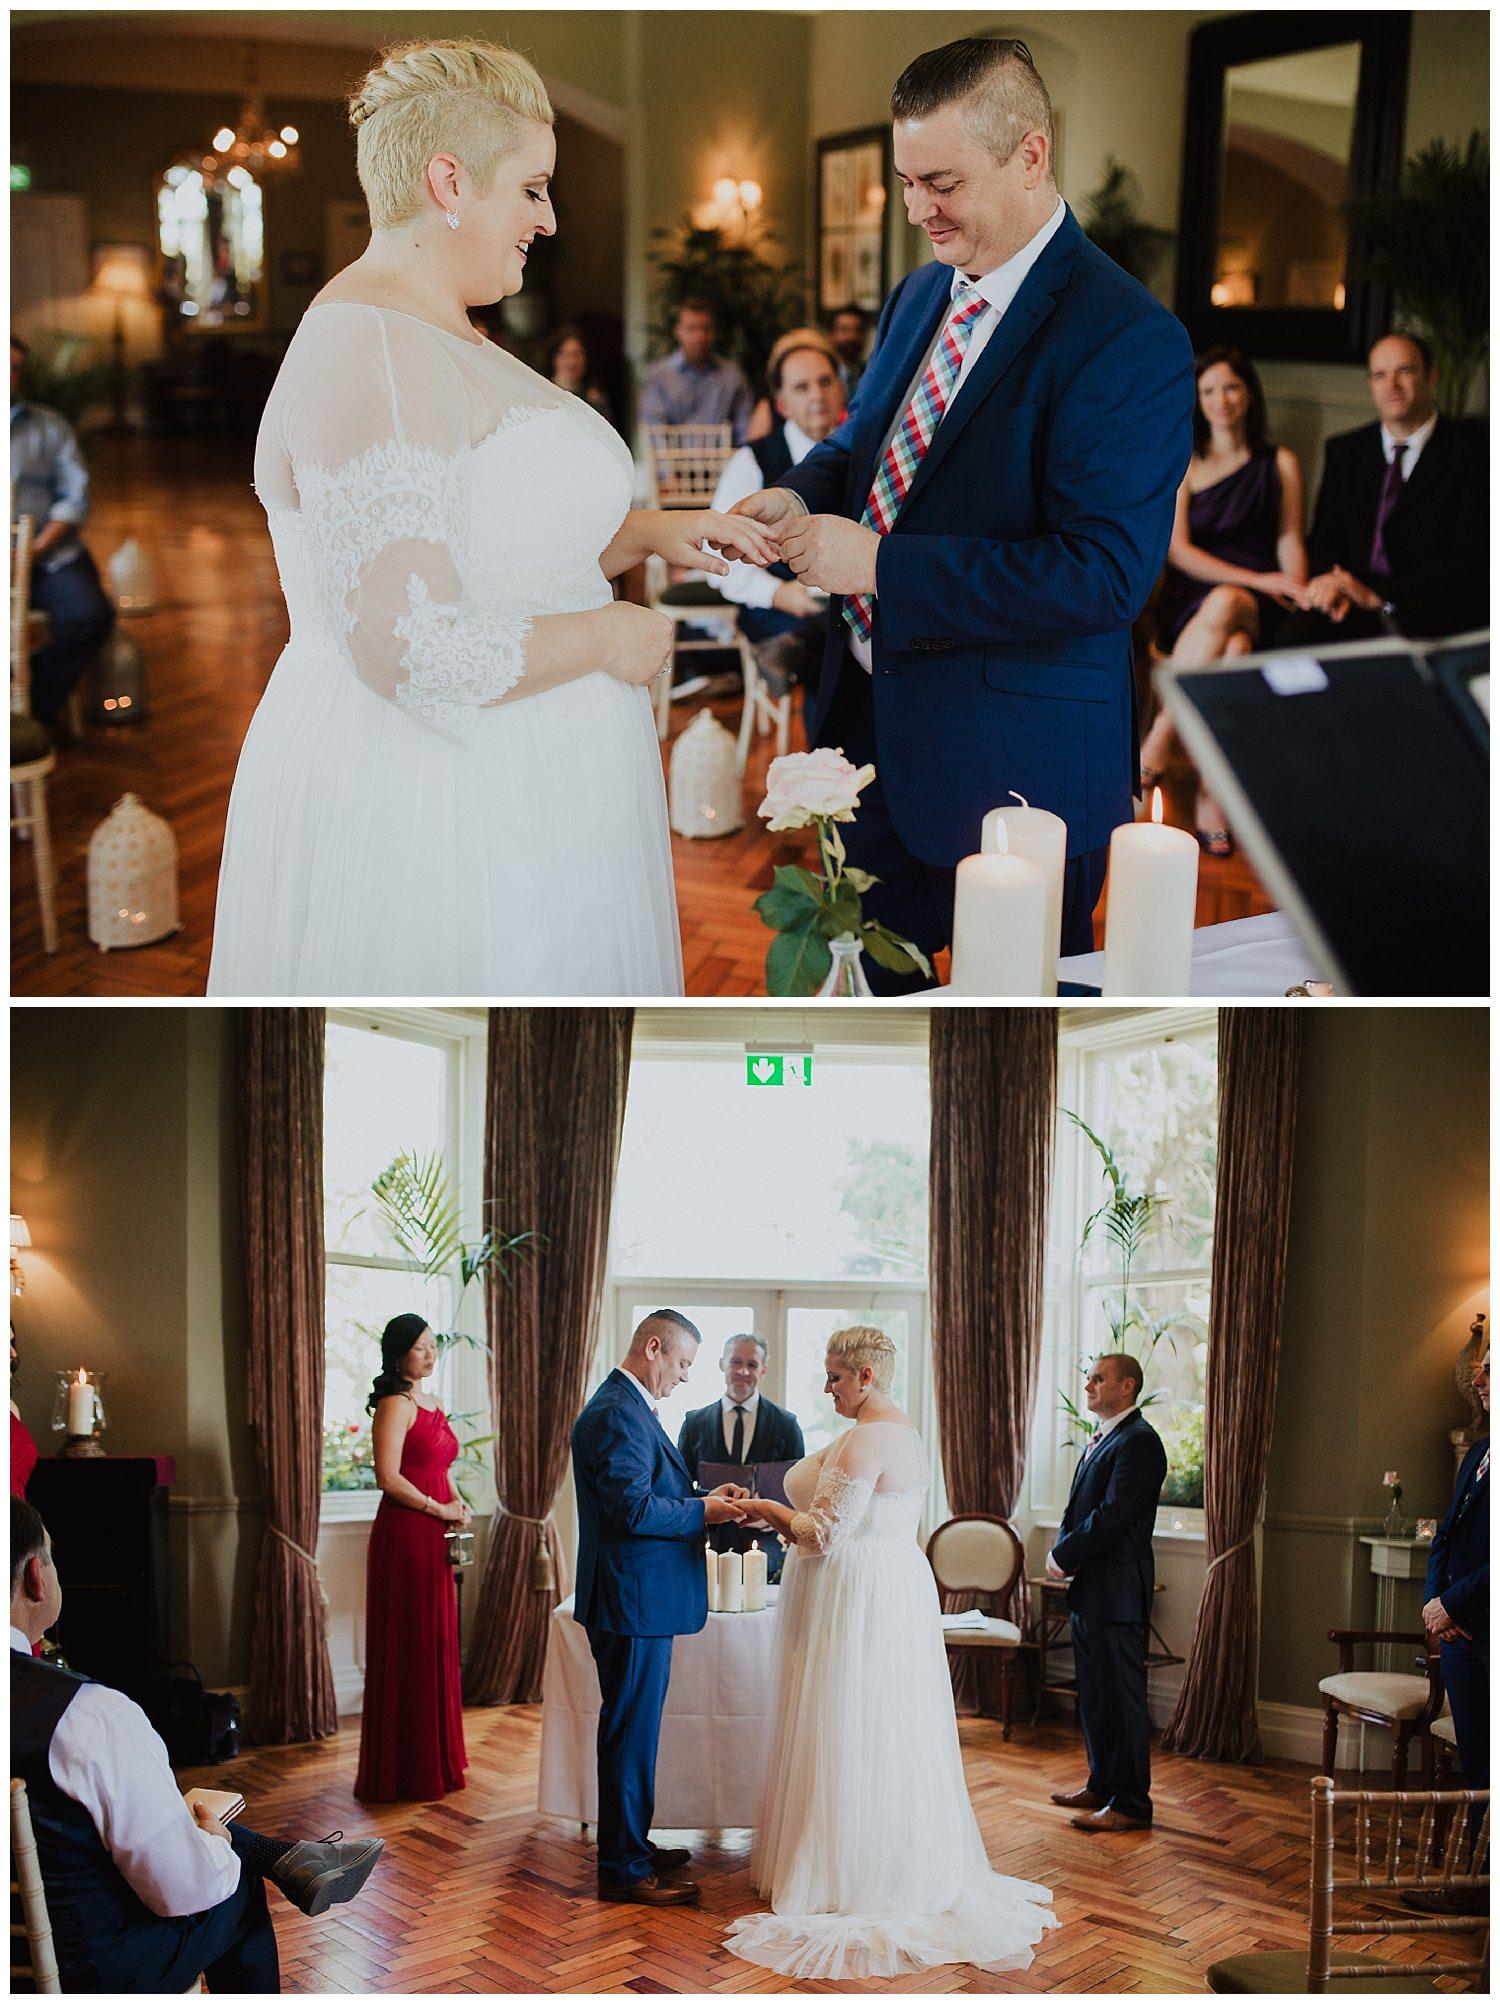 alternative_wedding_tinakilly_house_liviafigueiredo_384.jpg